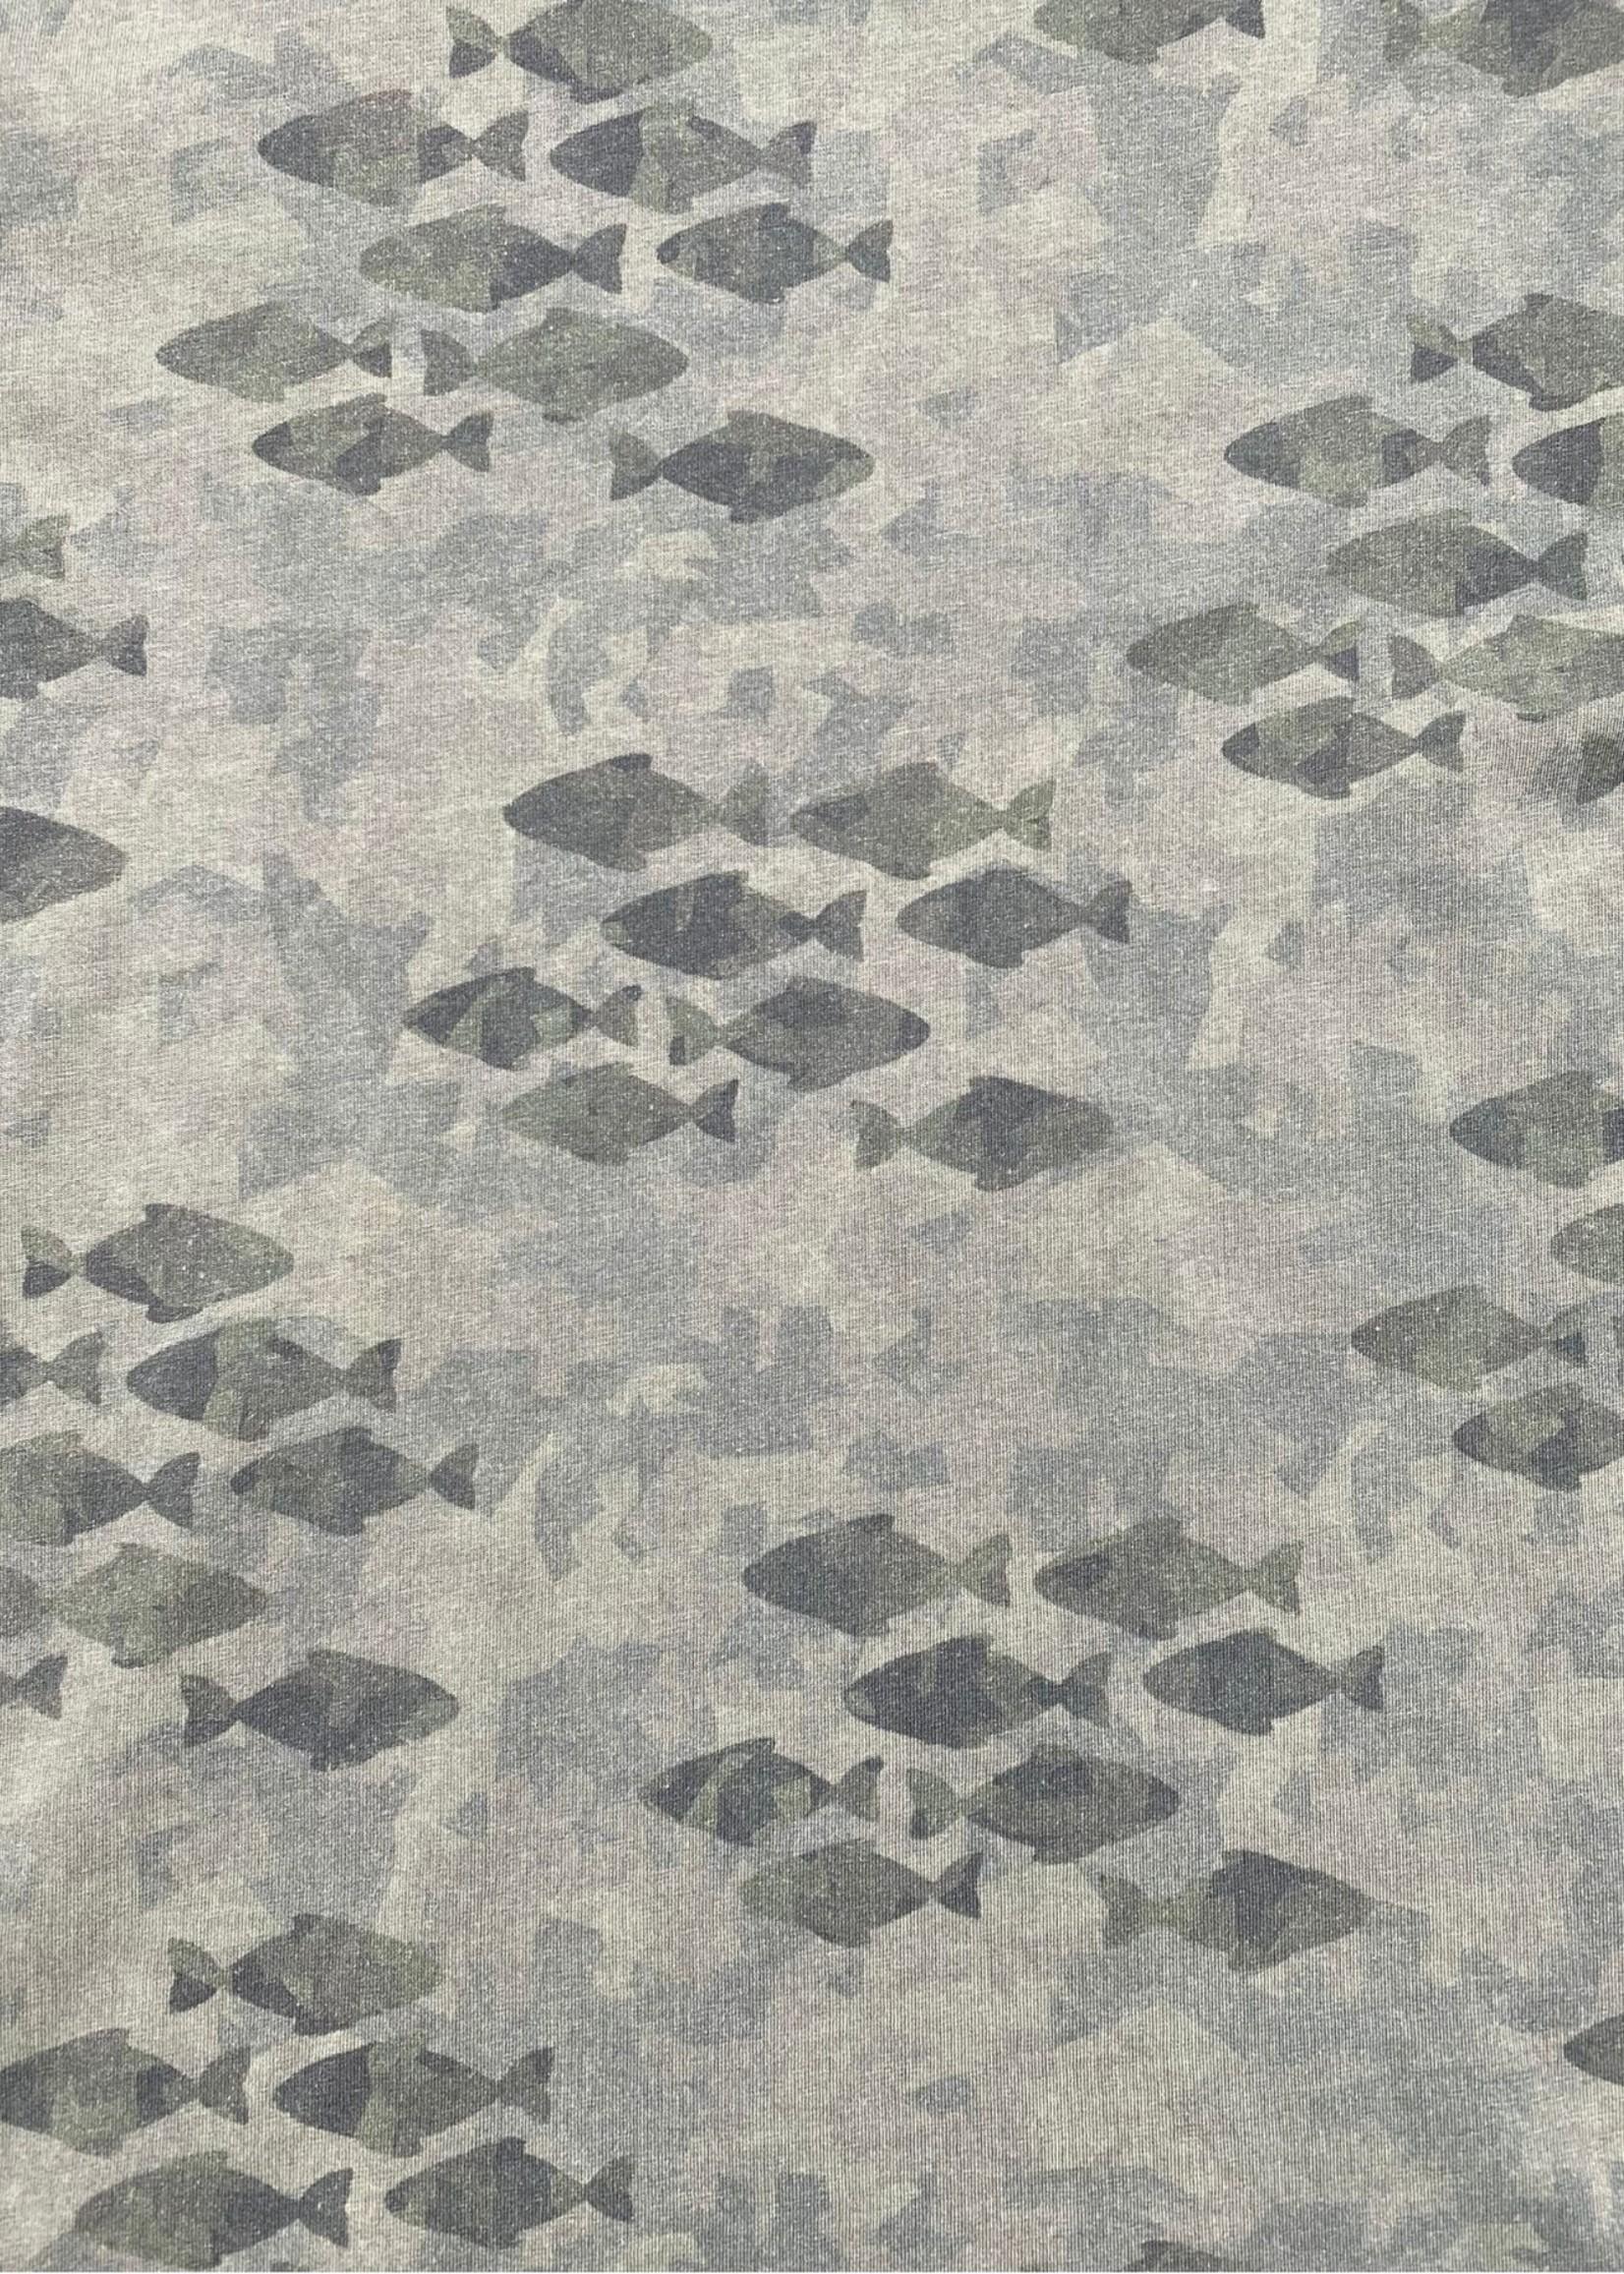 Take A Way T-Shirt Military Fishes | Legergroen | Take a Way